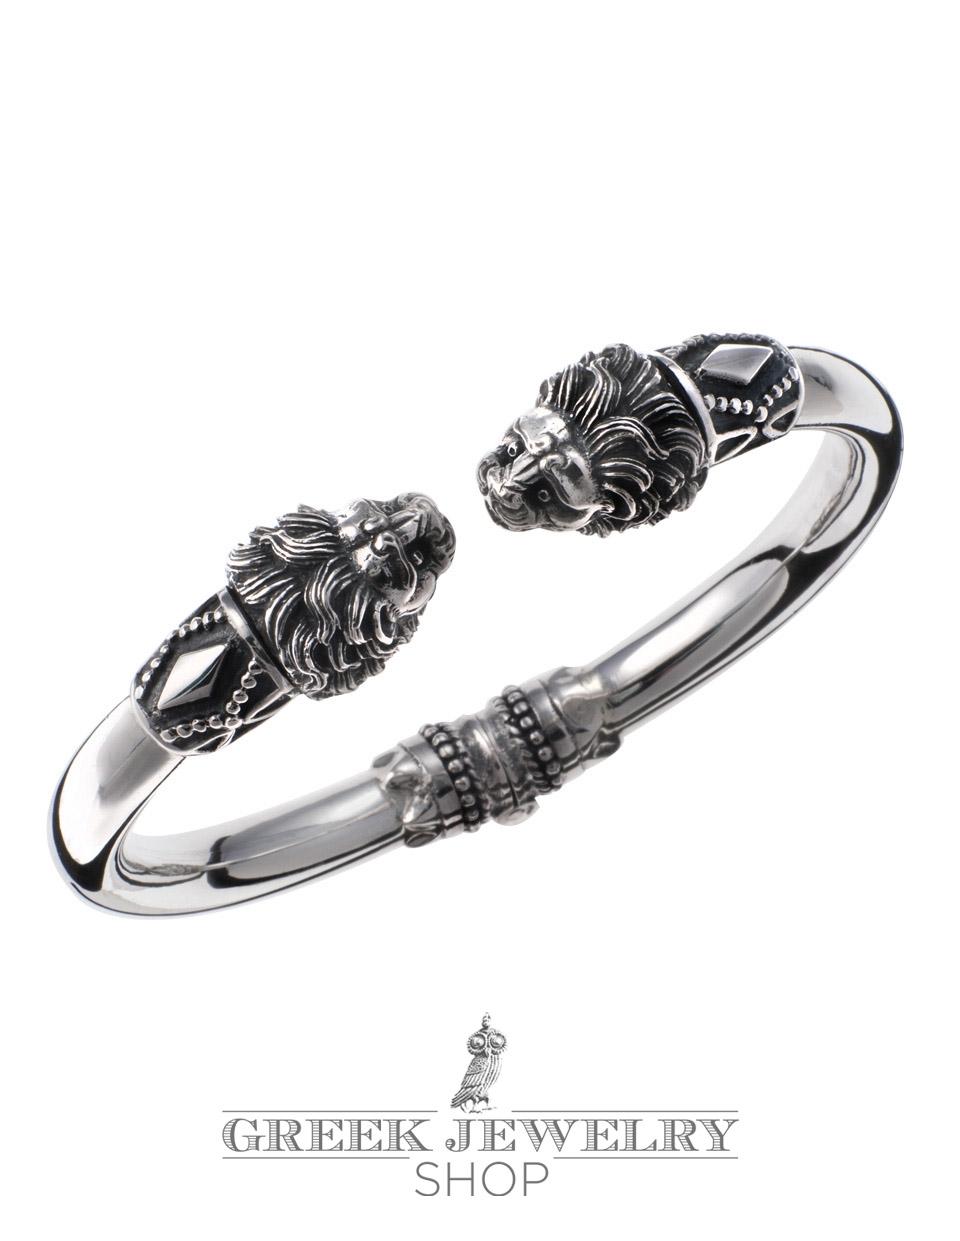 greek Jewelry Shop - Bracelets and torcs